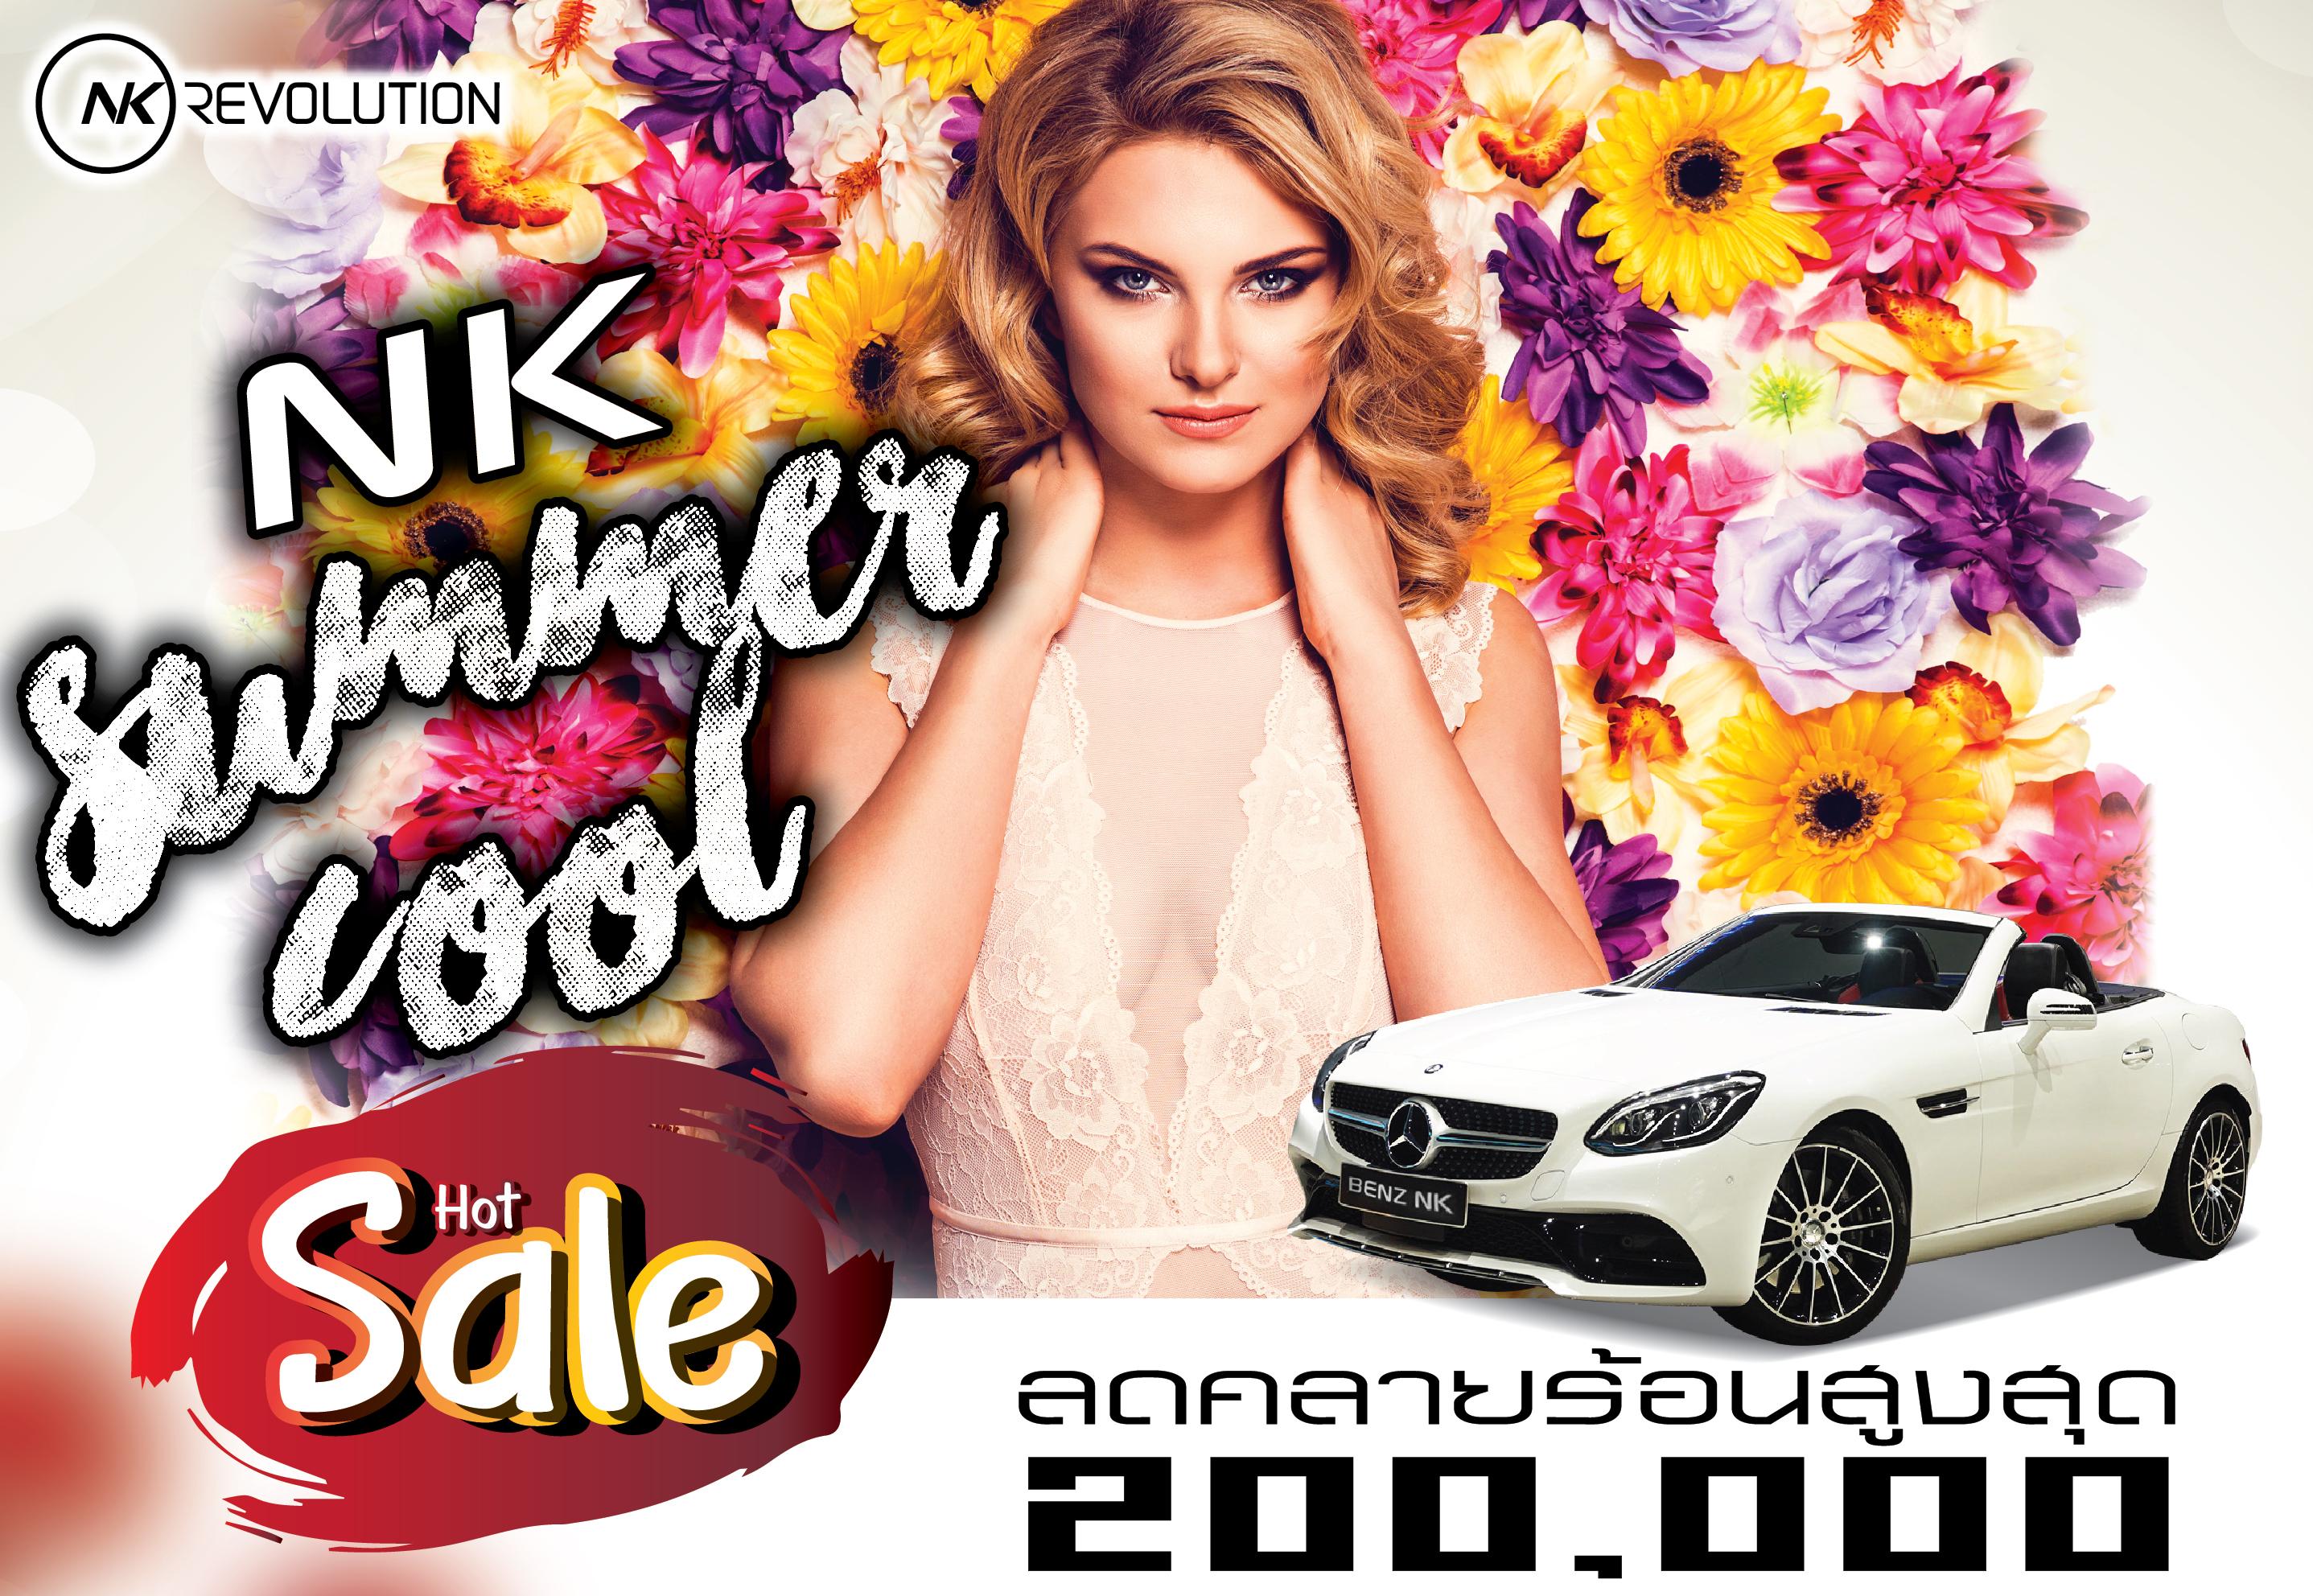 NK Summer Cool ลดคลายร้อนสูงสุด 200,000 บาท